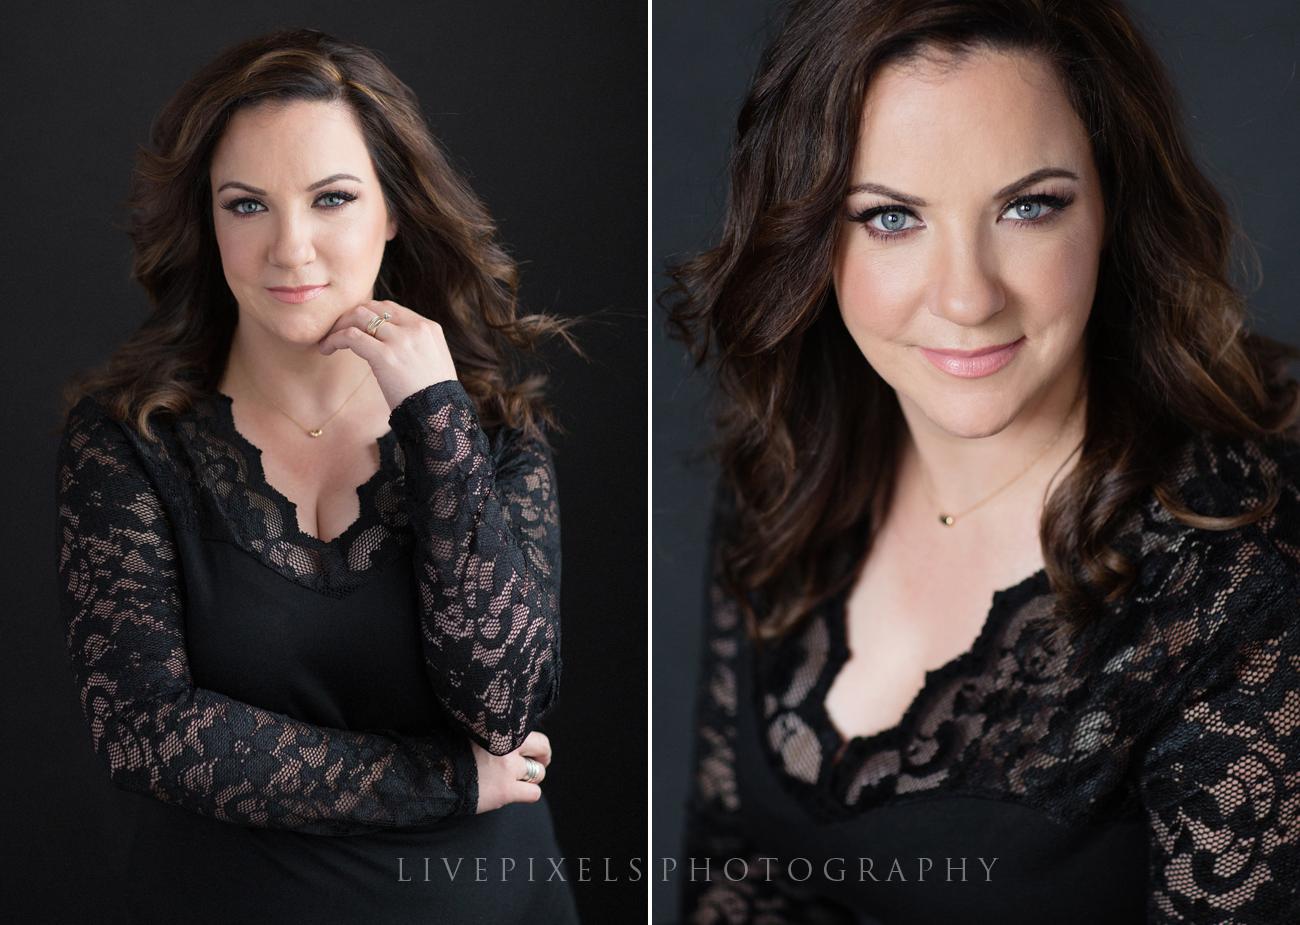 Toronto Glamour Portrait Photographer - Livepixels Photography, Toronto / livepixelsphotography.com